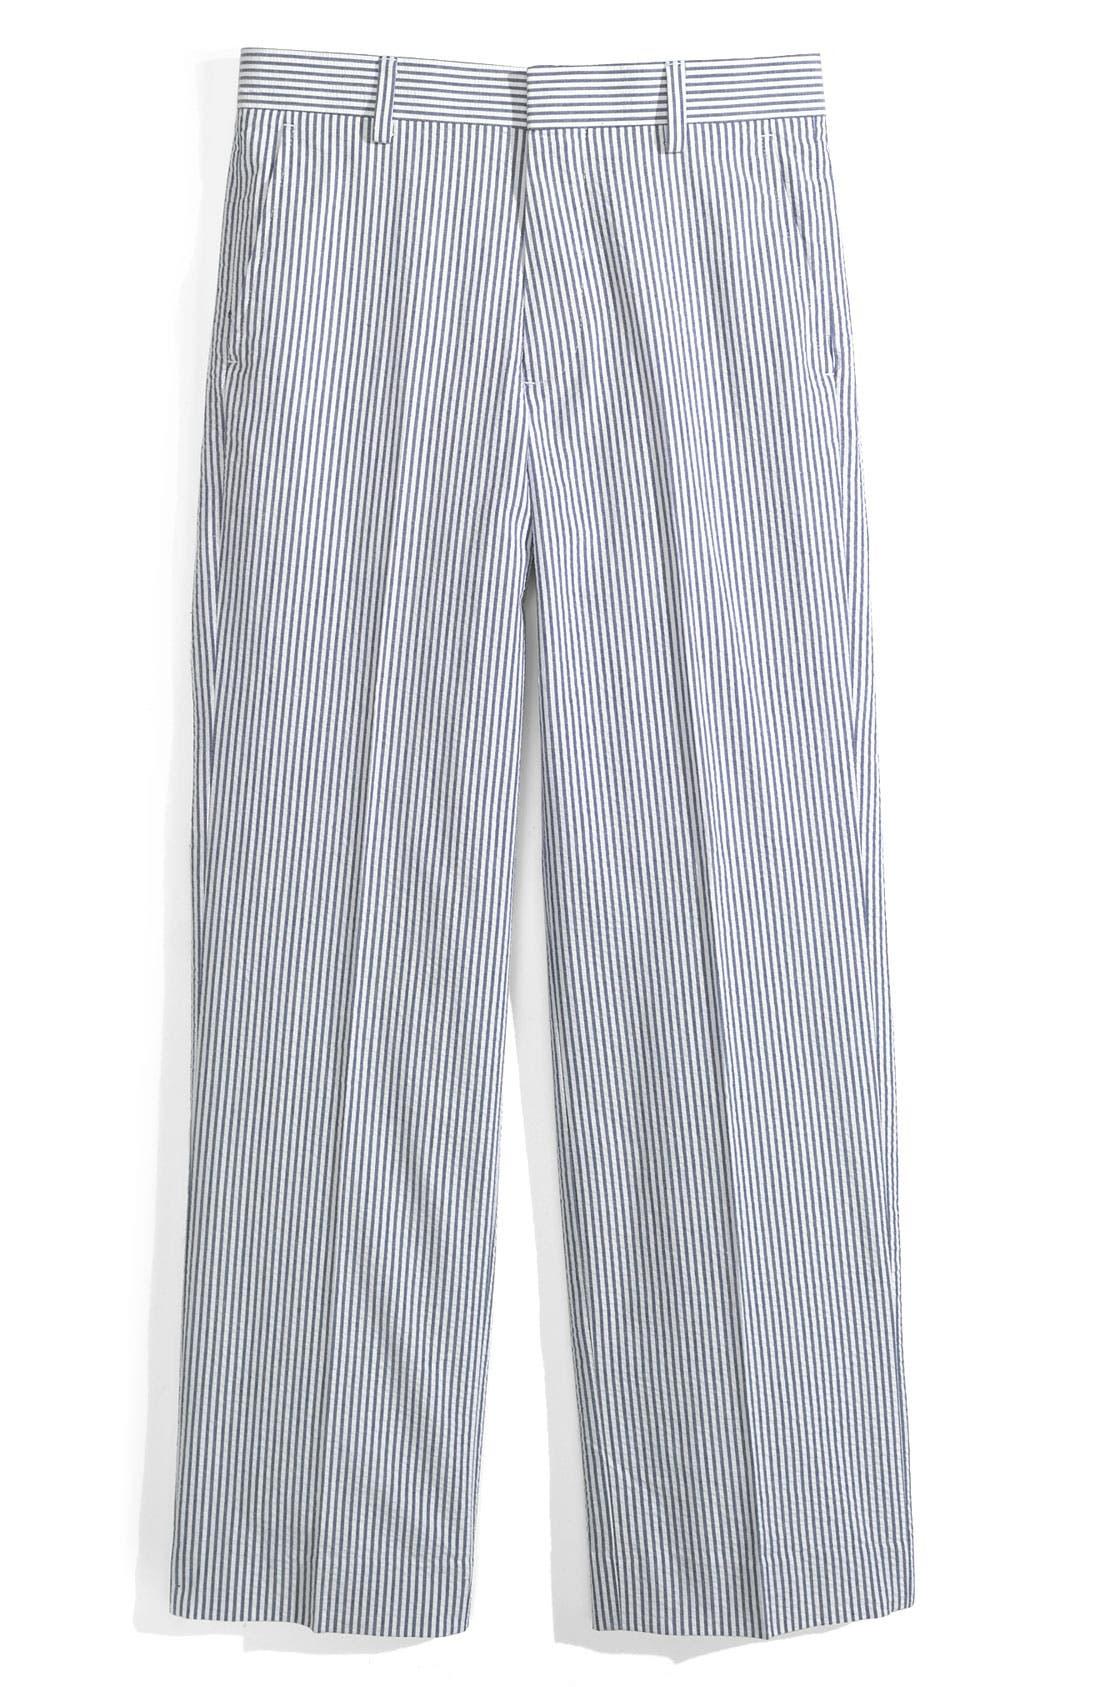 Main Image - Nordstrom Seersucker Pants (Little Boys & Big Boys)